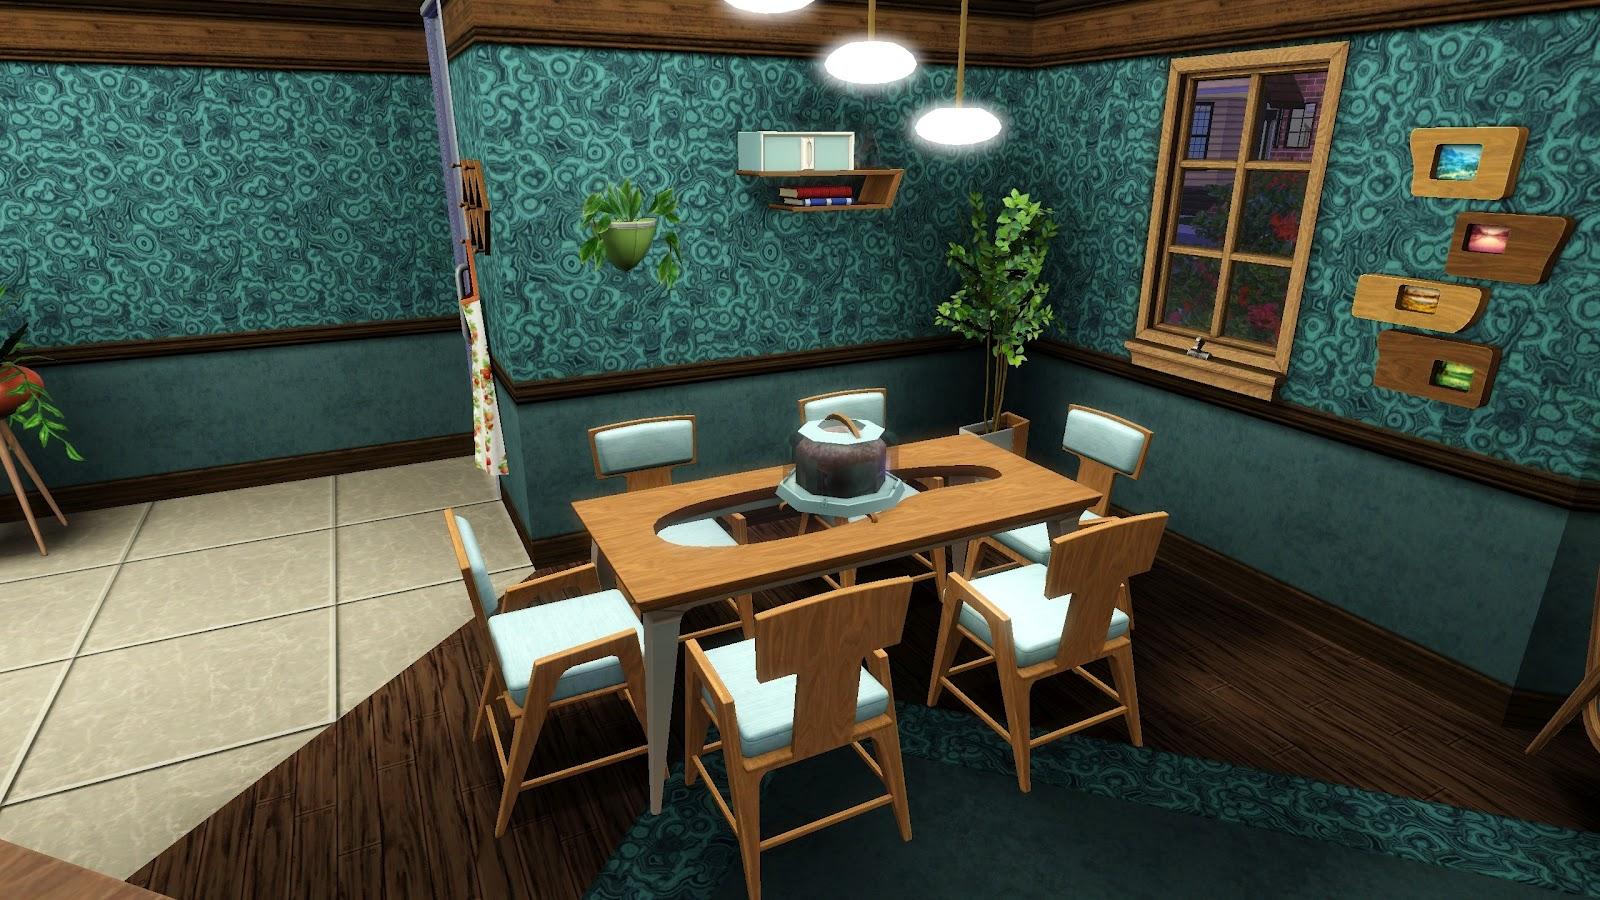 The Iron Seagull 39 S Sims Showcase The Sims 3 Store Mid Century Modern Di